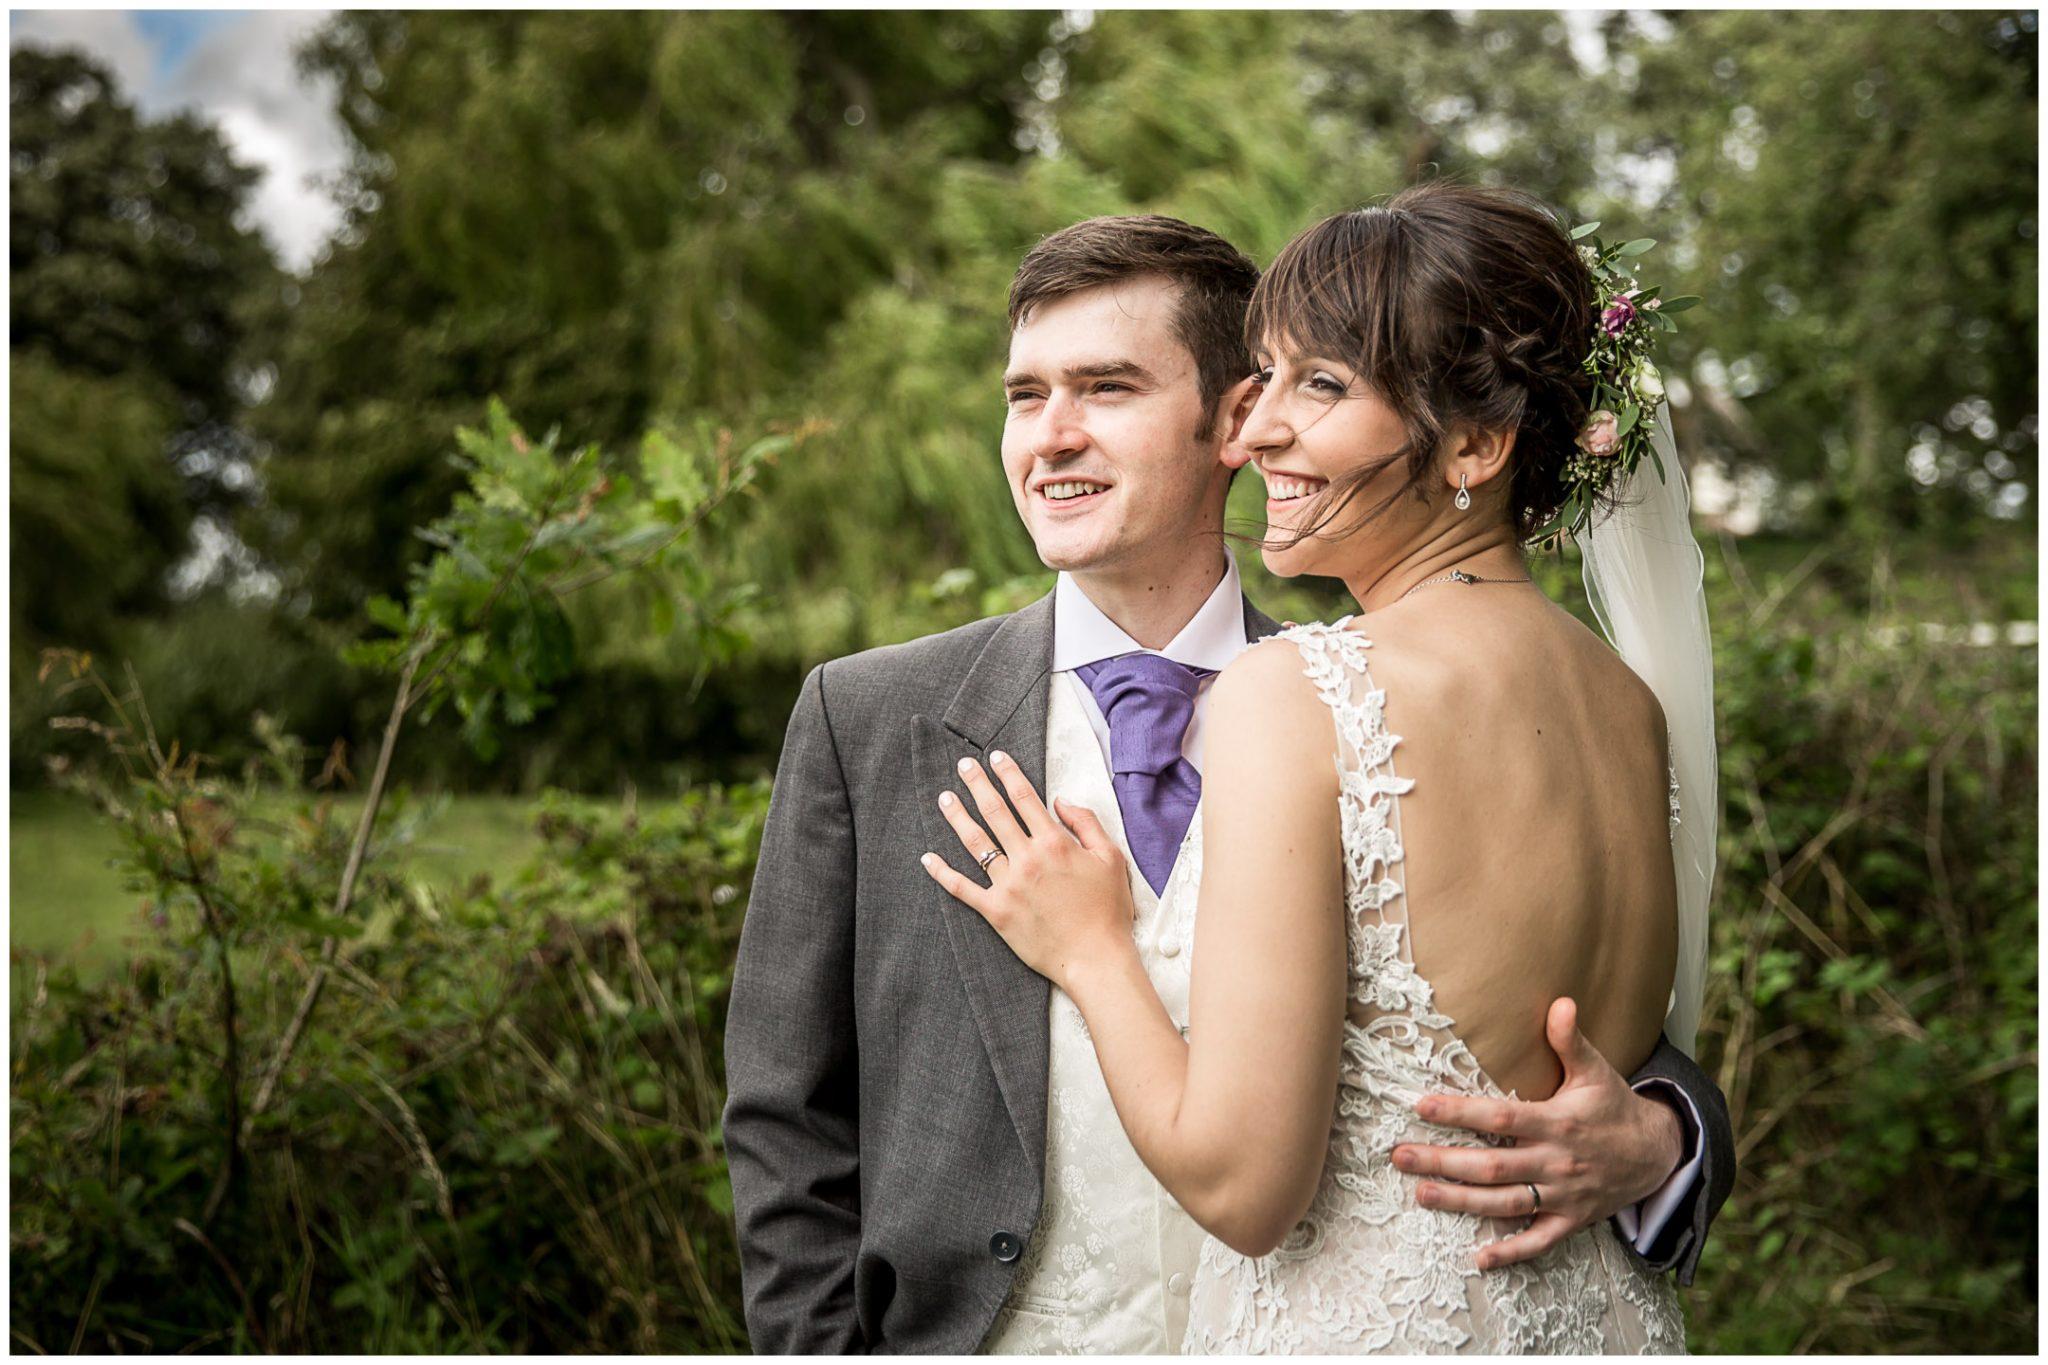 Sopley Mill wedding photography bride and groom